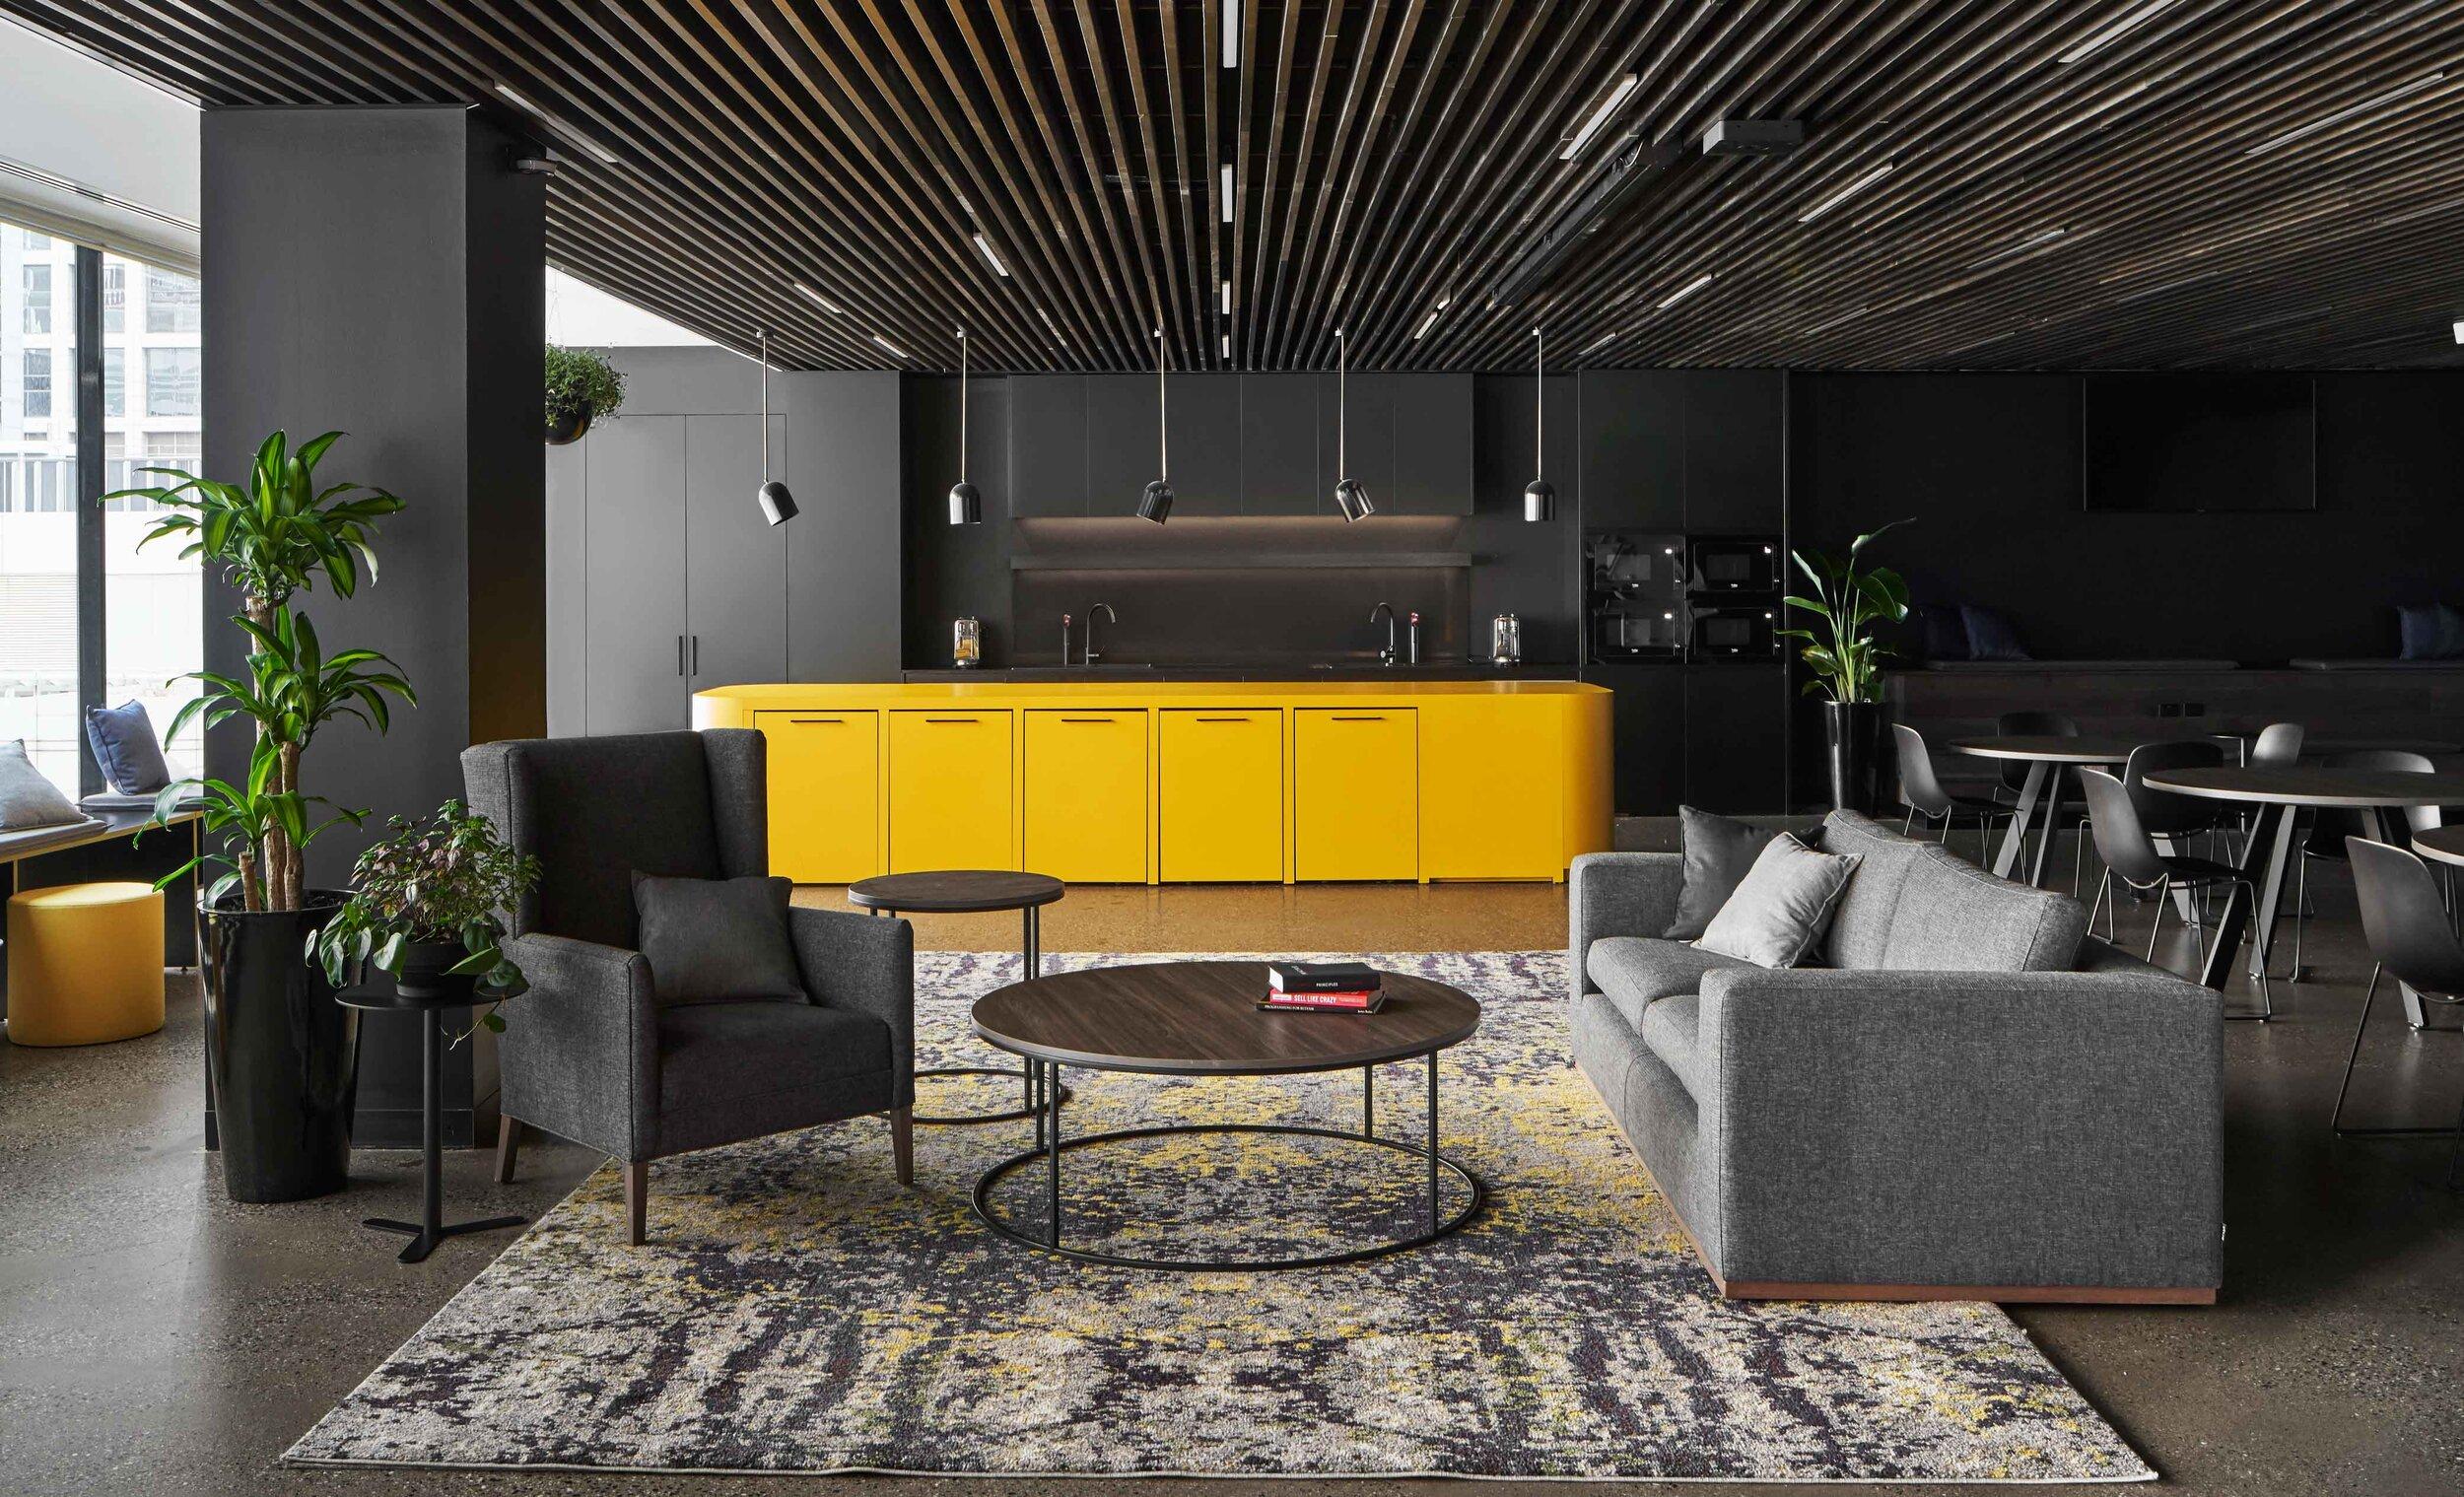 Betfair Office Kitchen and Lounge Interior Design